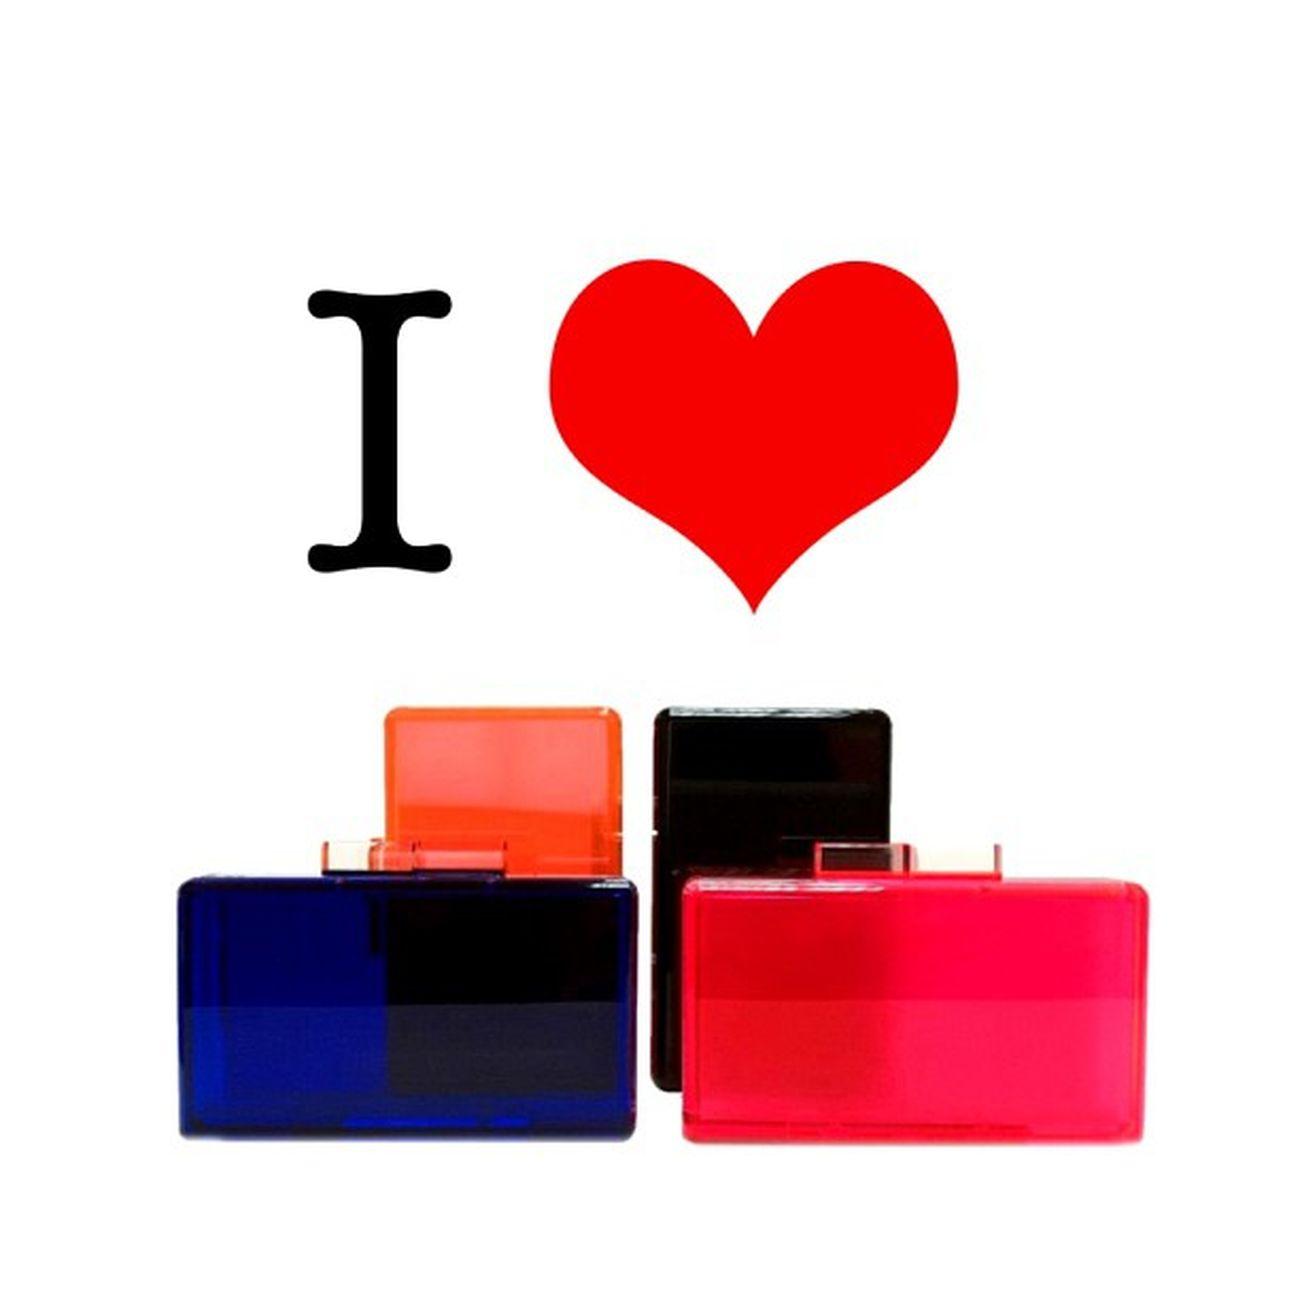 Do you love ❤ URANIA GAZELLI? Dare to Share!!! Perspex Lucite Plexiglass Clutch bag minaudiere fashion design greece athens paris london dubai kuwait moscow russia singapure thailand milan italy uae usa newyork ny miami california losangeles uraniagazelli @valerydemureltd @hermione_hh @leivankash @blankboutique @harveynicholsdubai @boutique_sauvage @solandgravite